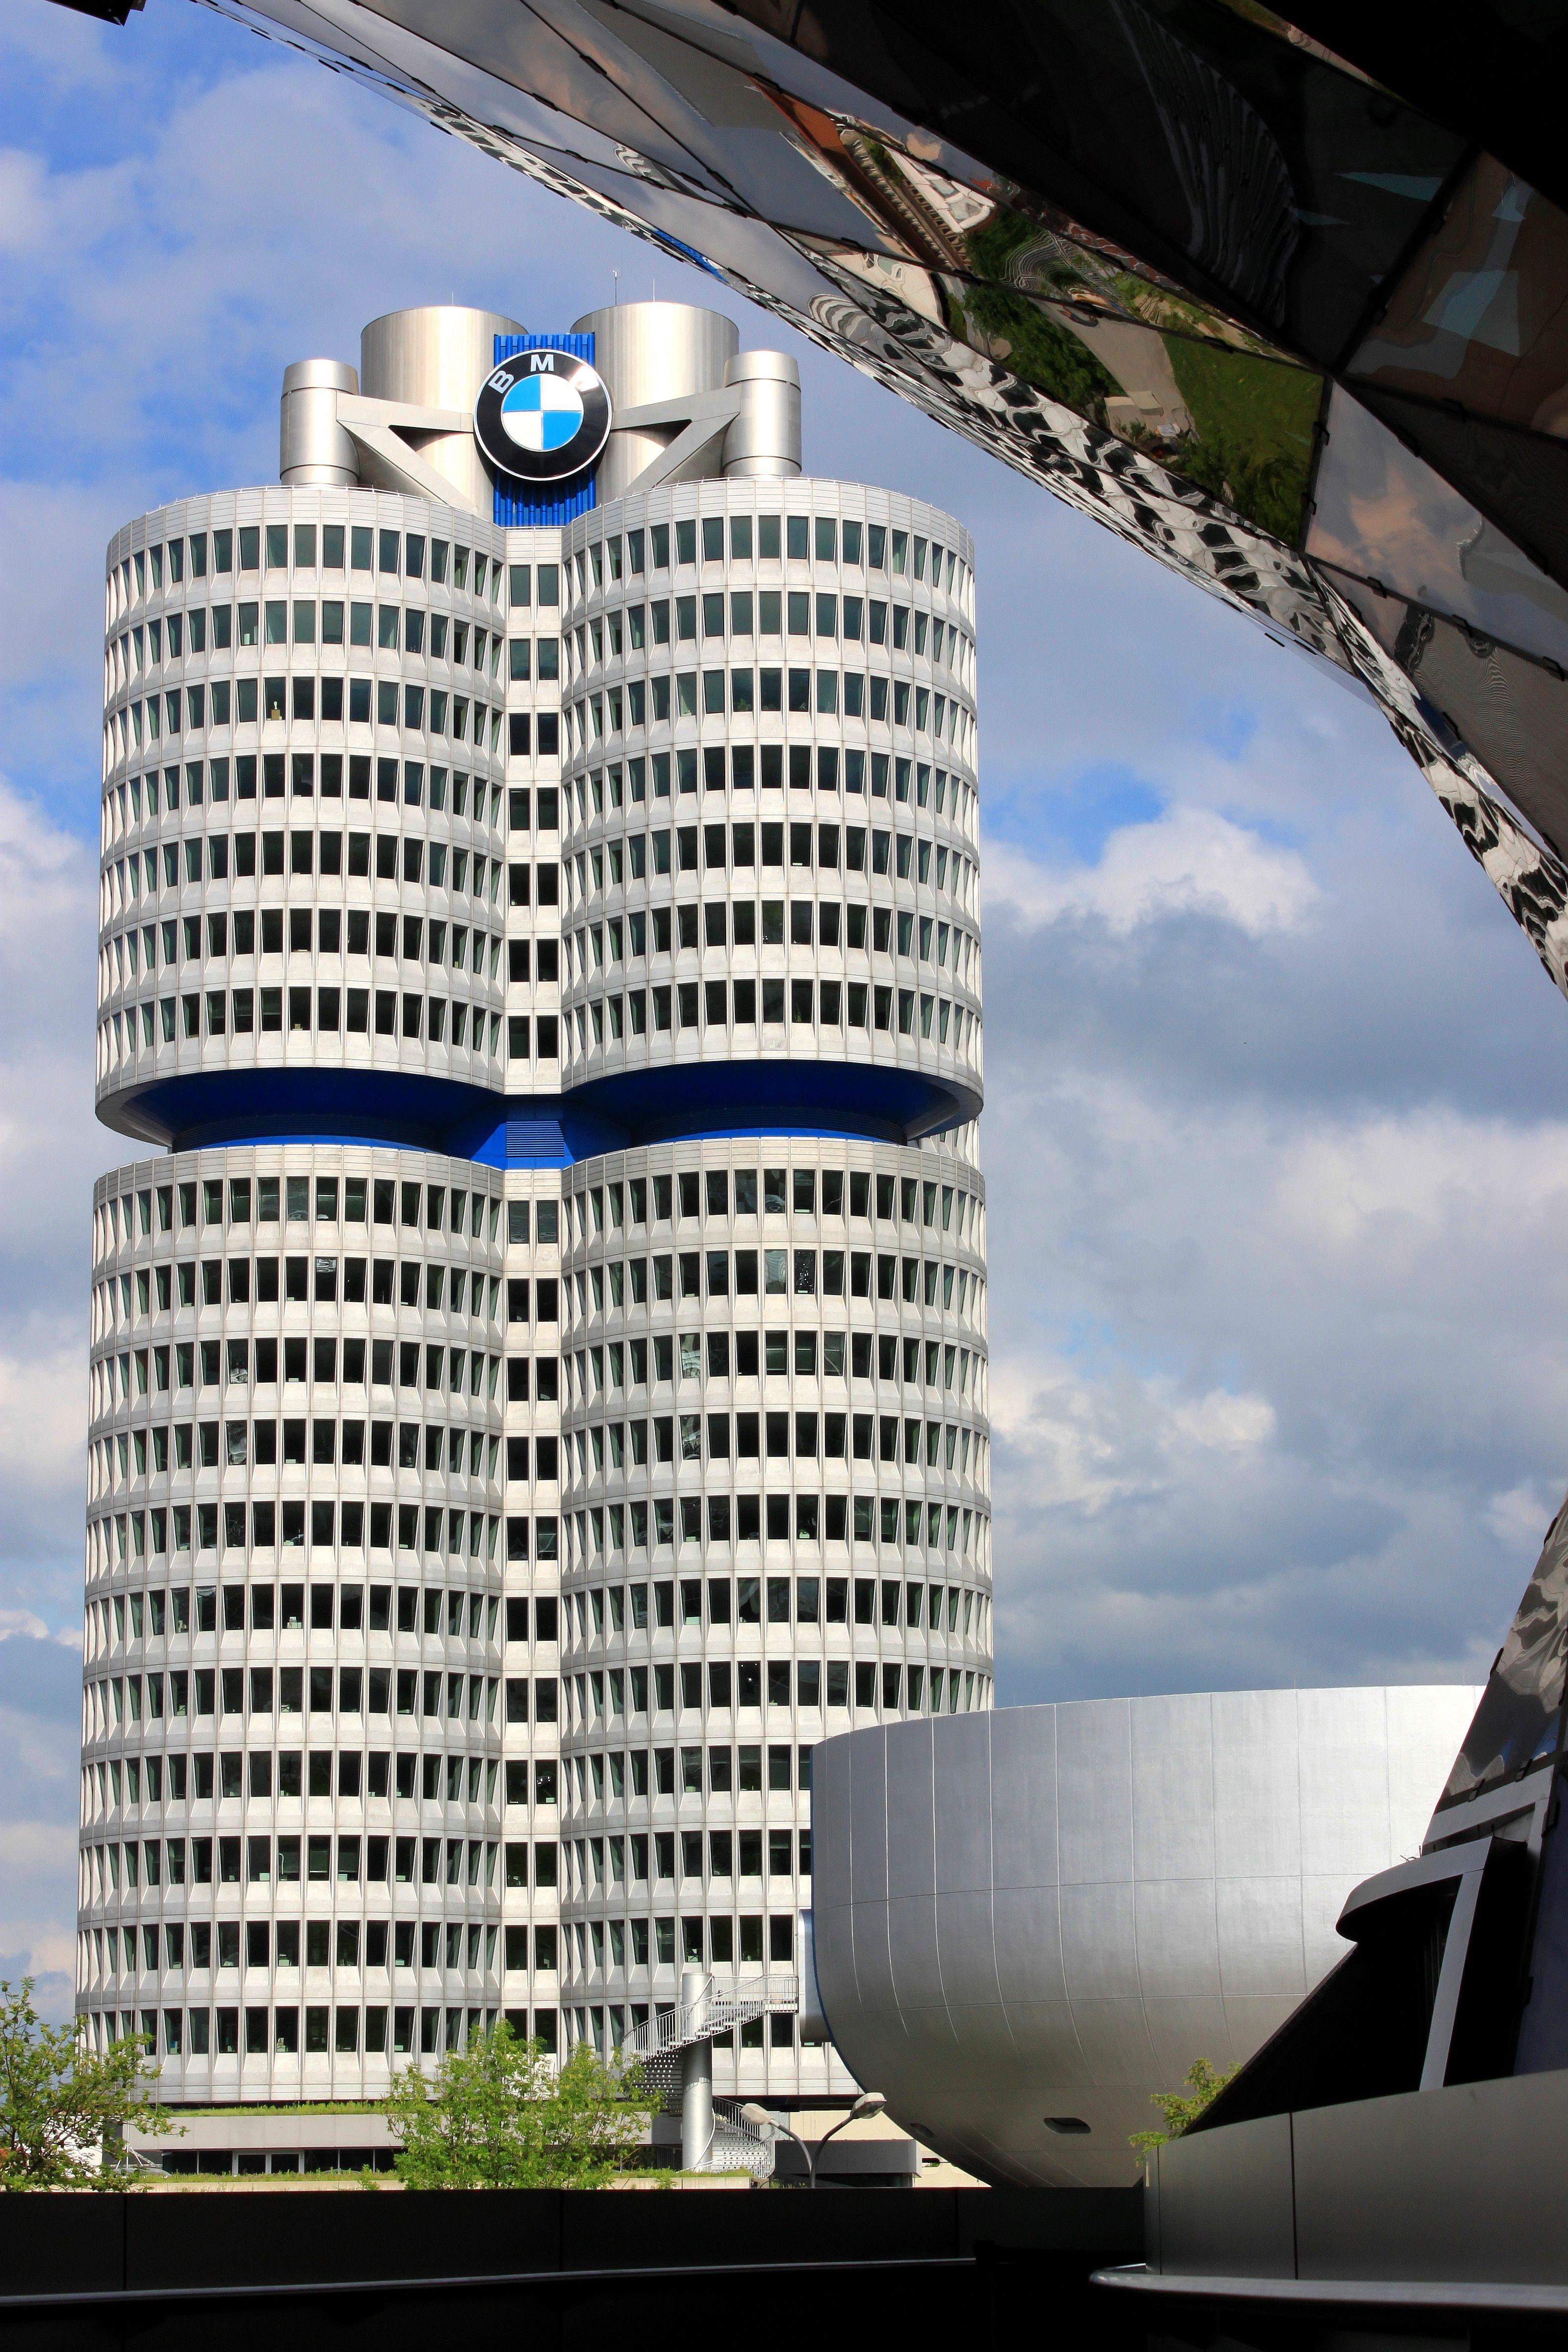 Bmw Welt Munich Germany Travel Munich Munich Germany